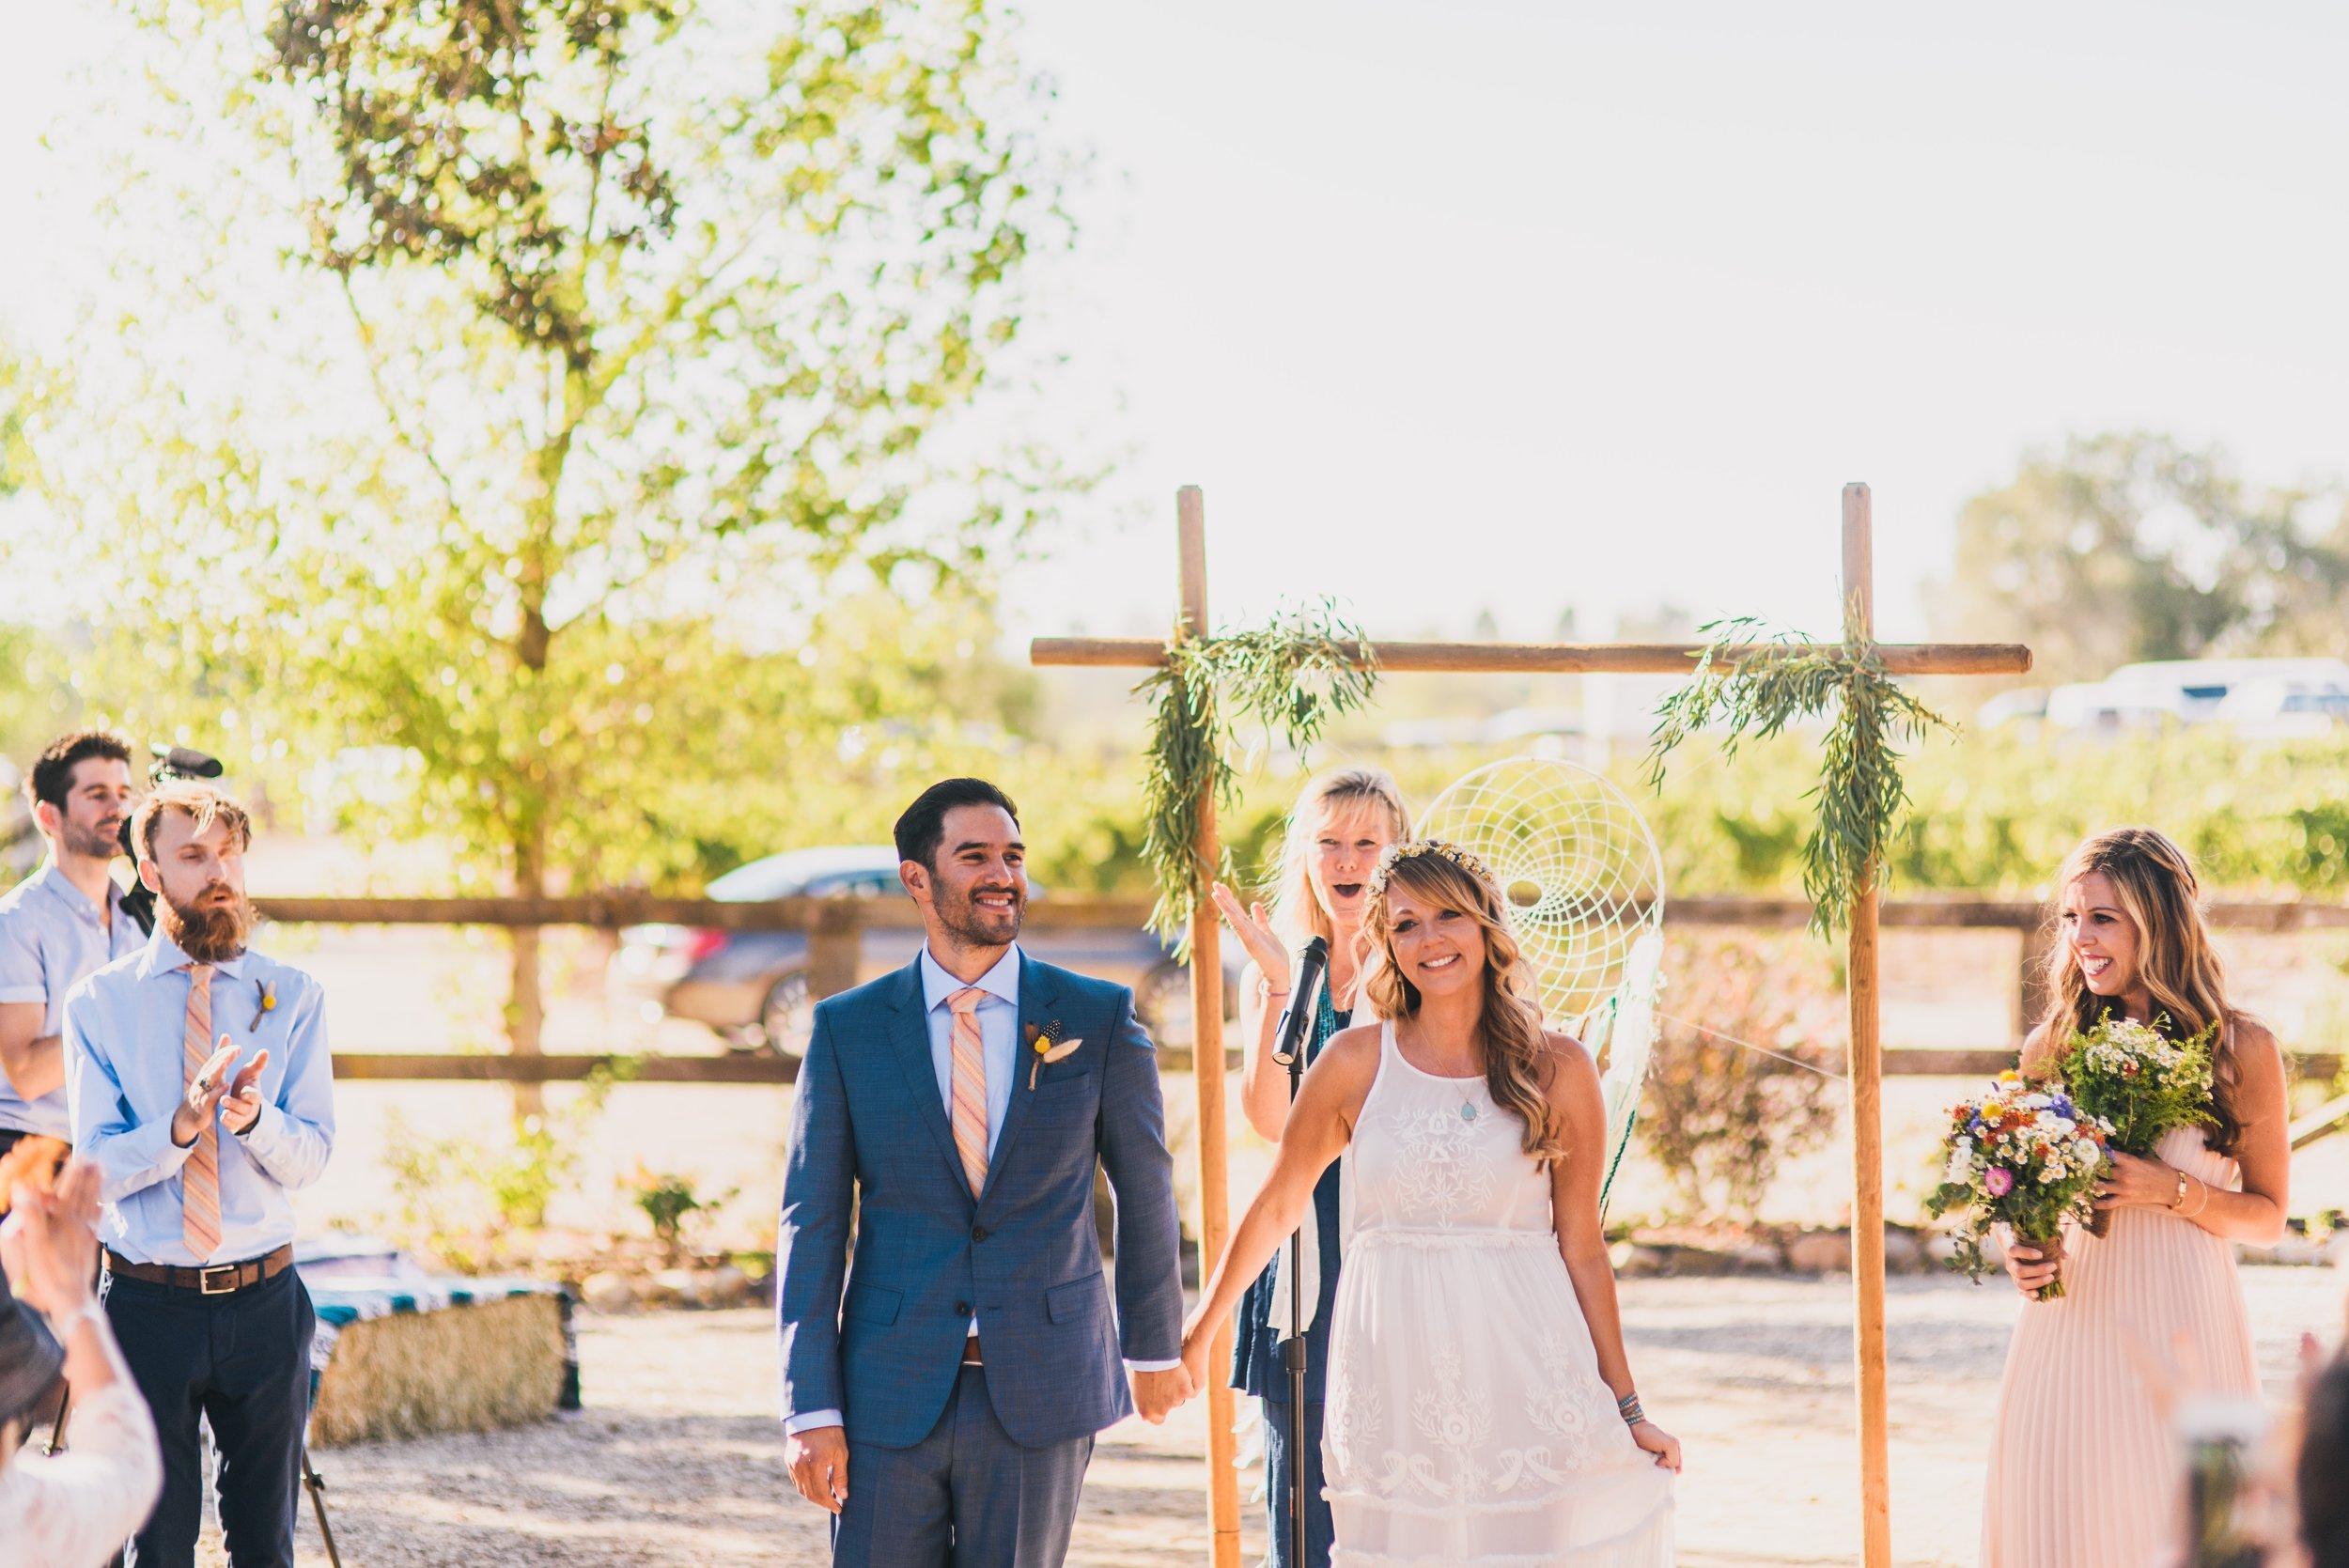 Weddings - A.jpg